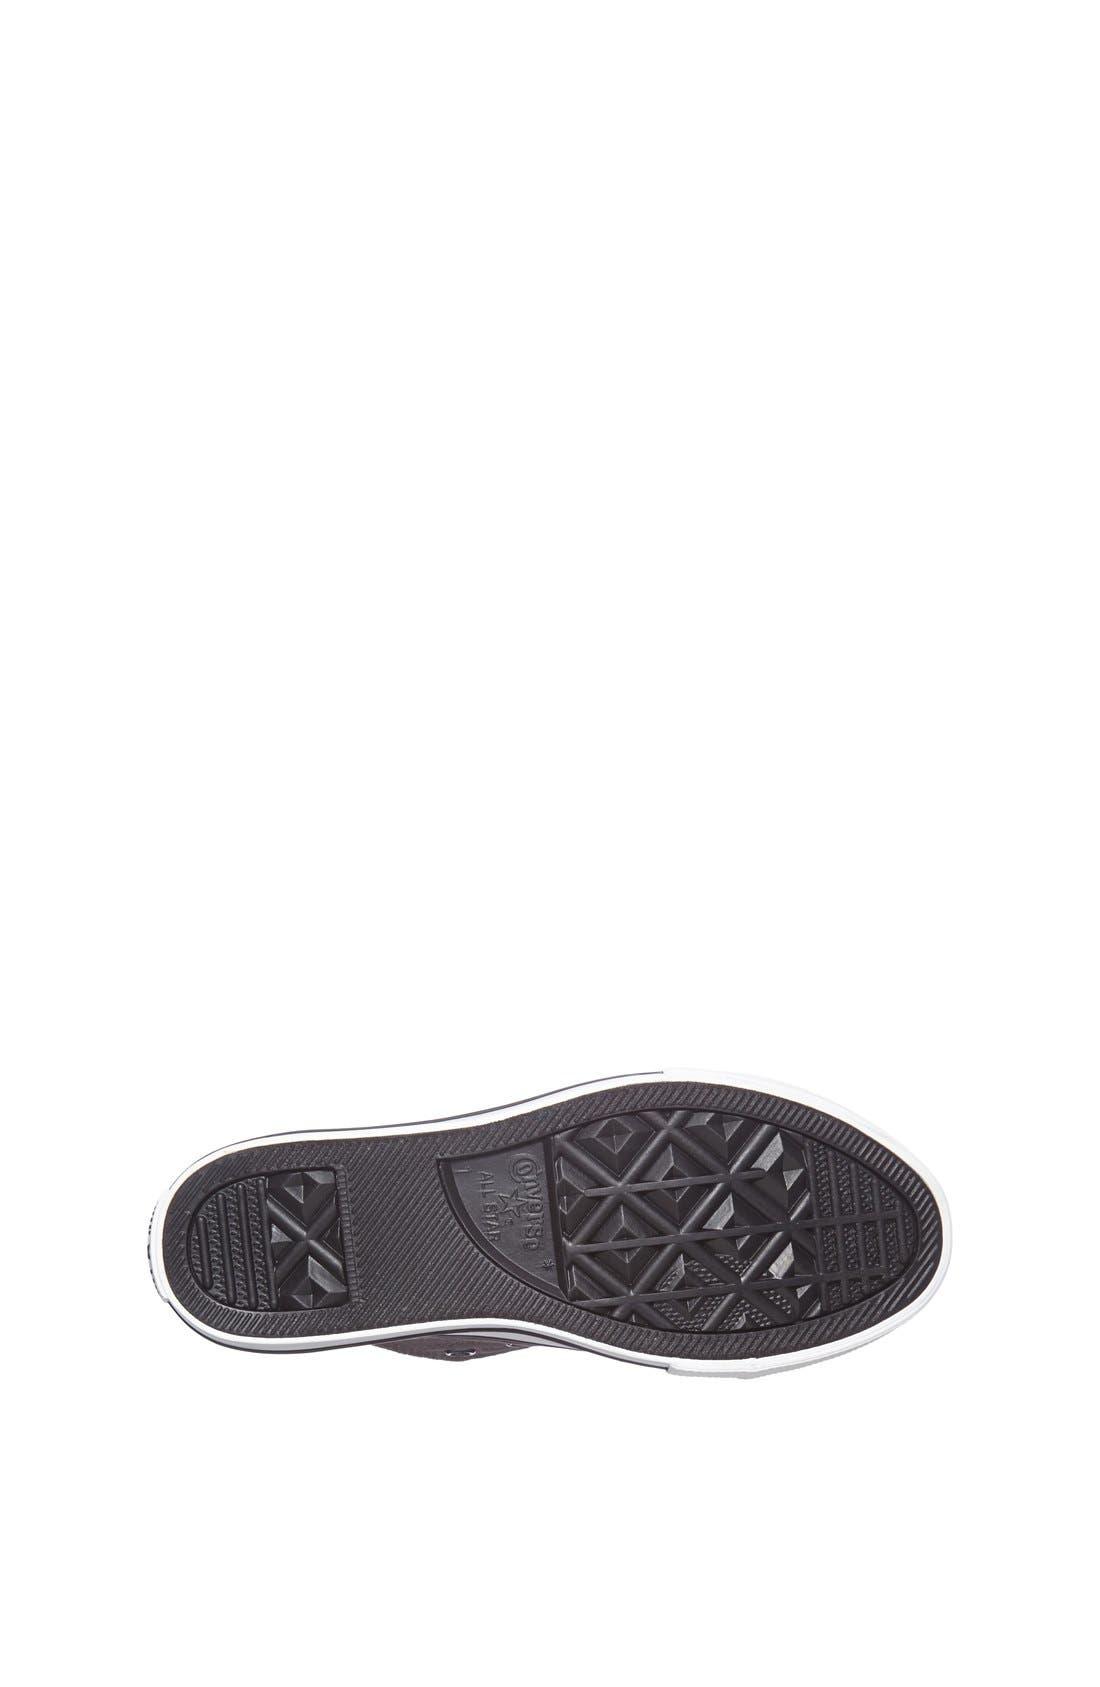 Alternate Image 4  - Converse Chuck Taylor® Double Zip Sneaker (Toddler, Little Kid & Big Kid)